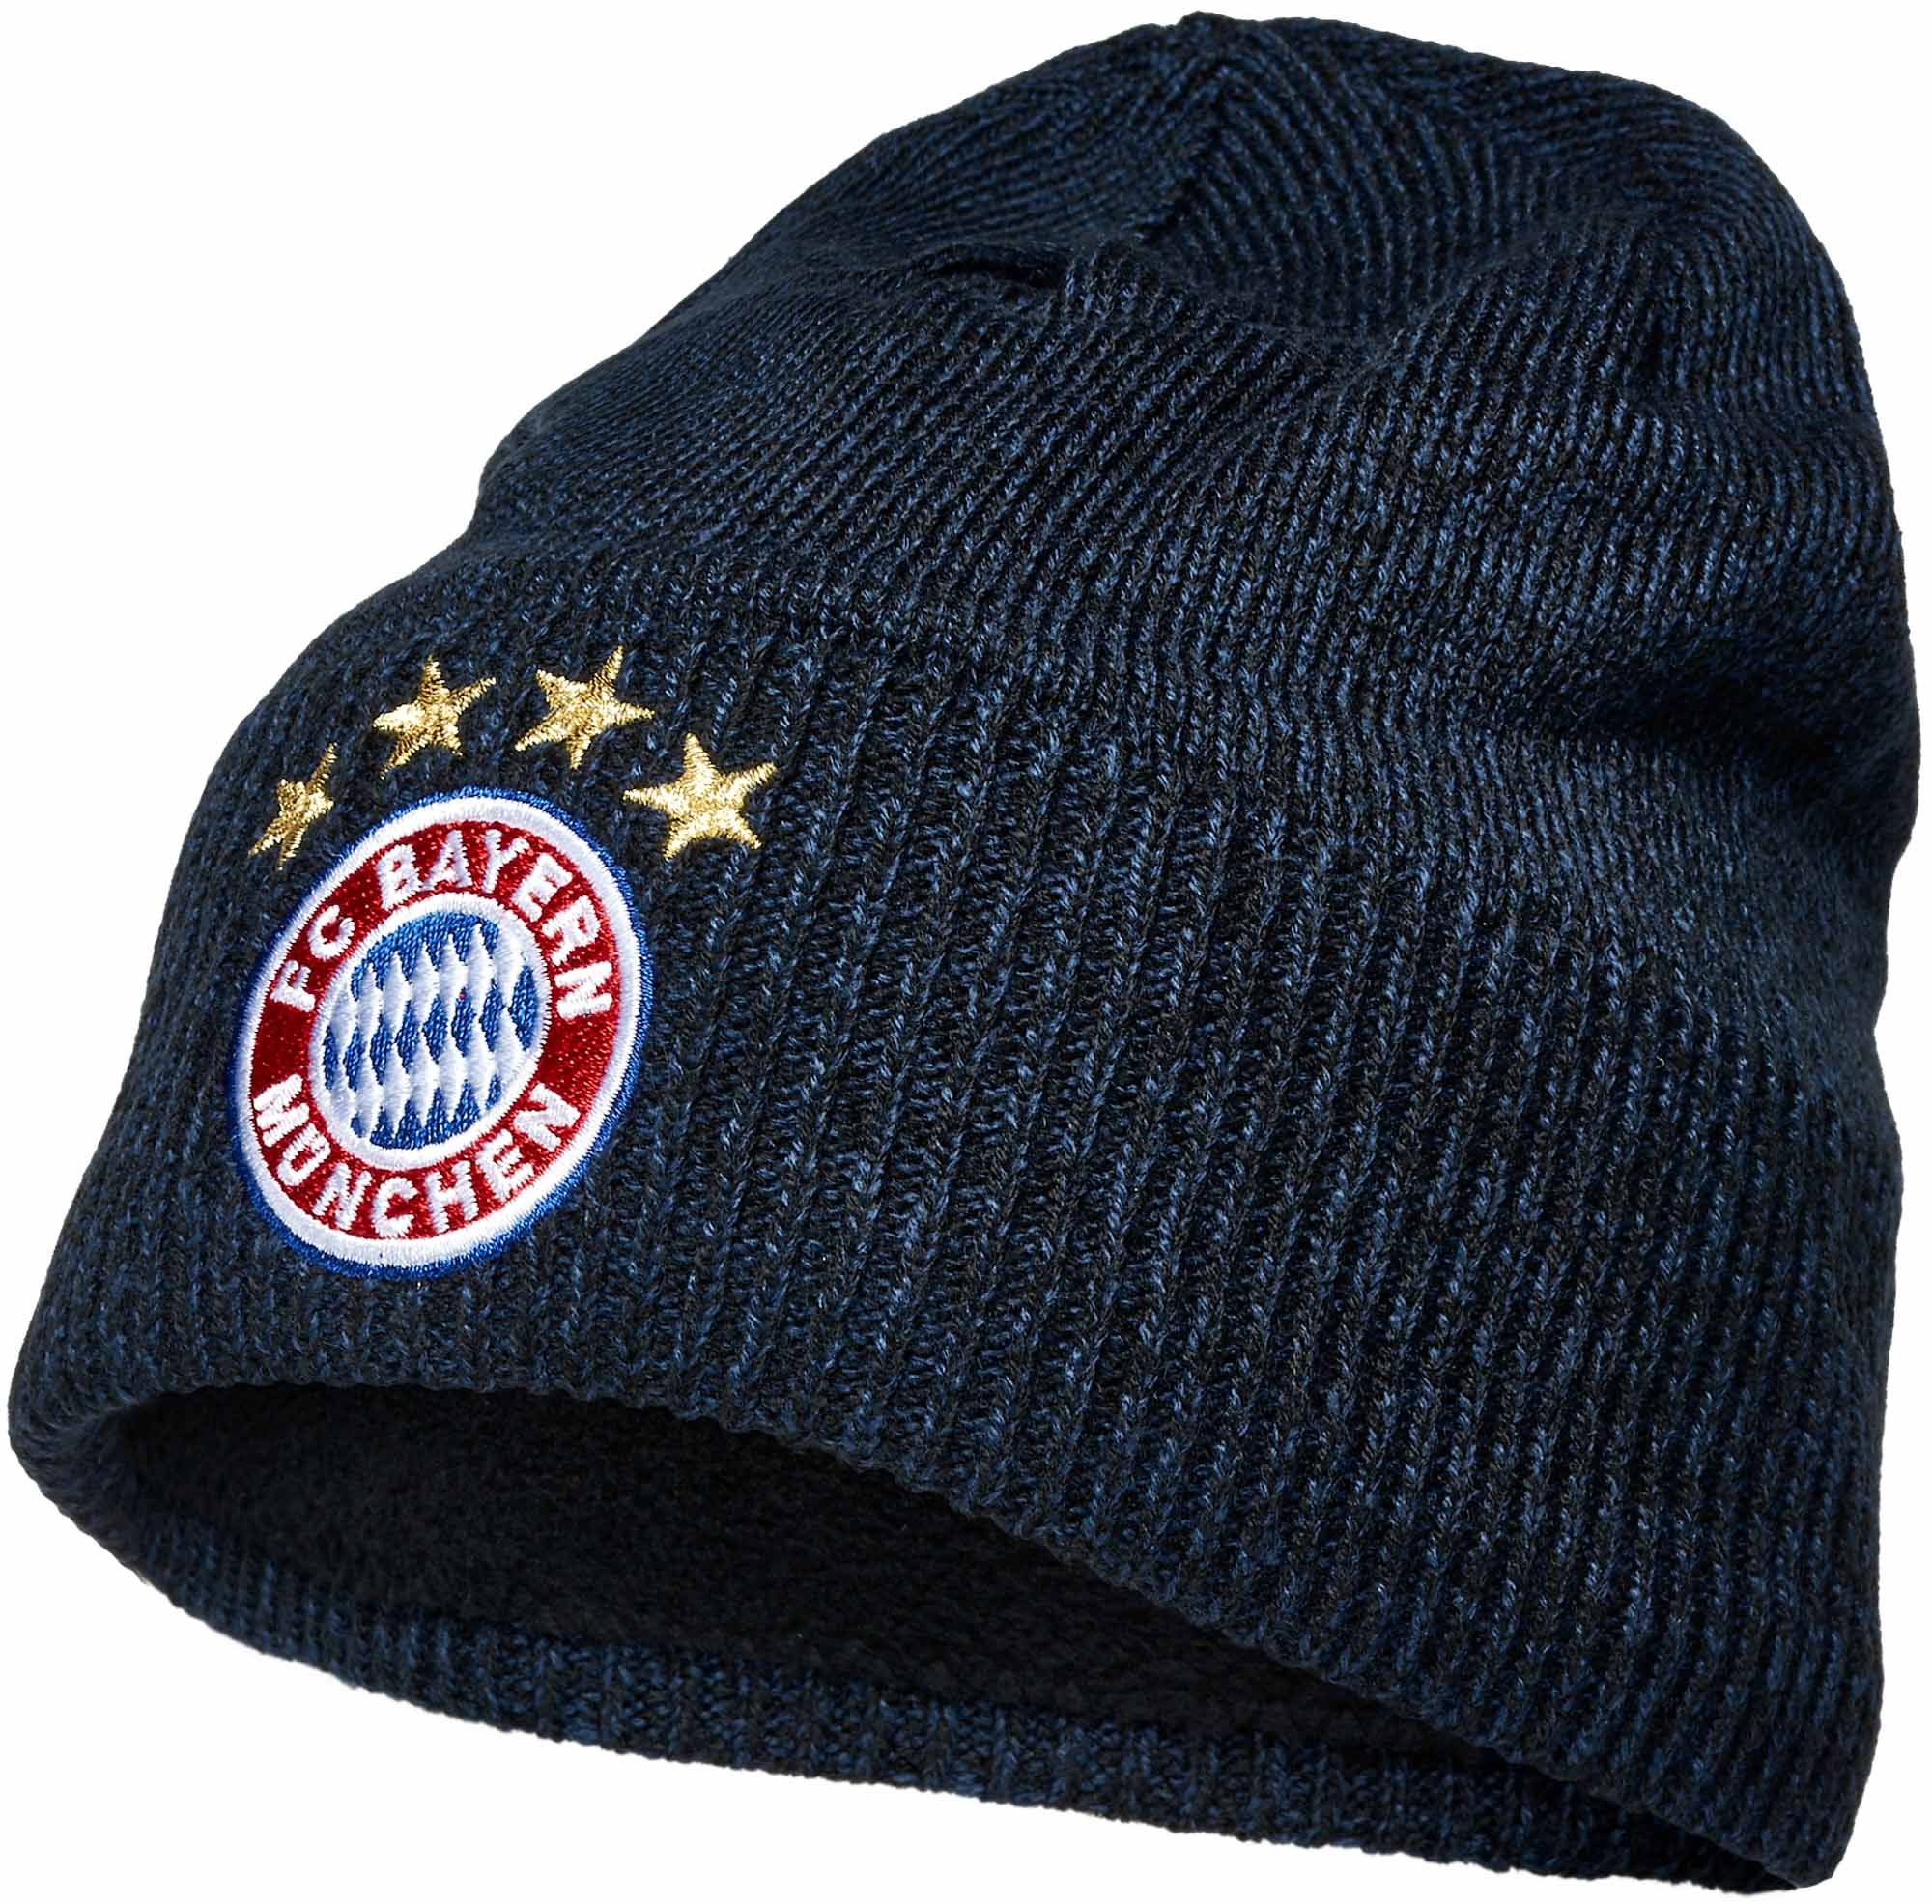 3c2cb71b14f adidas Bayern Munich Beanie - Collegiate Navy   Black - Soccer Master